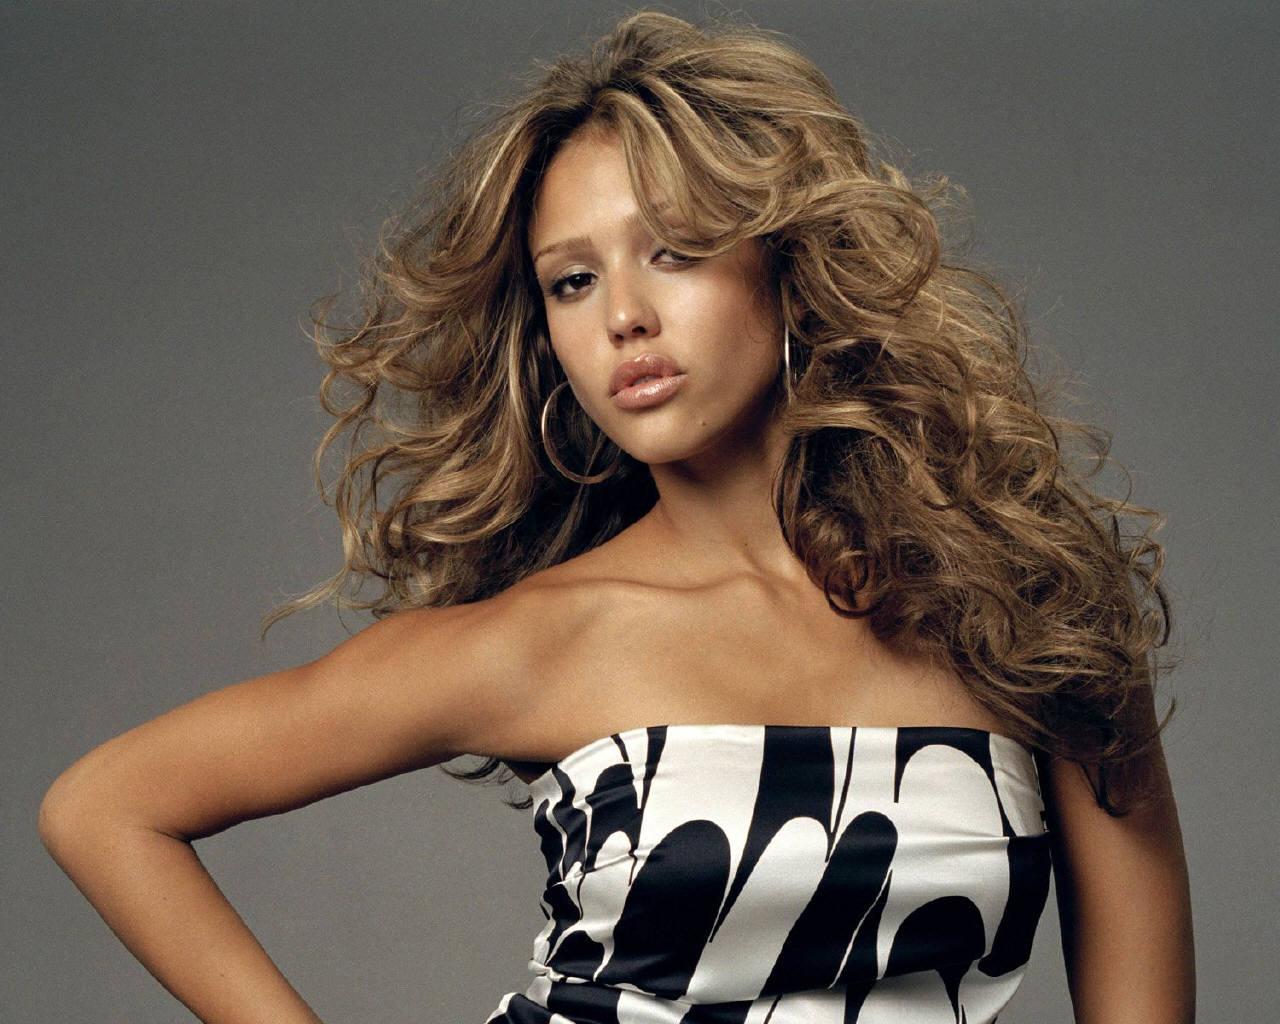 Desktop Wallpaper · Celebrities · Female Jessica Alba - free wallpapers